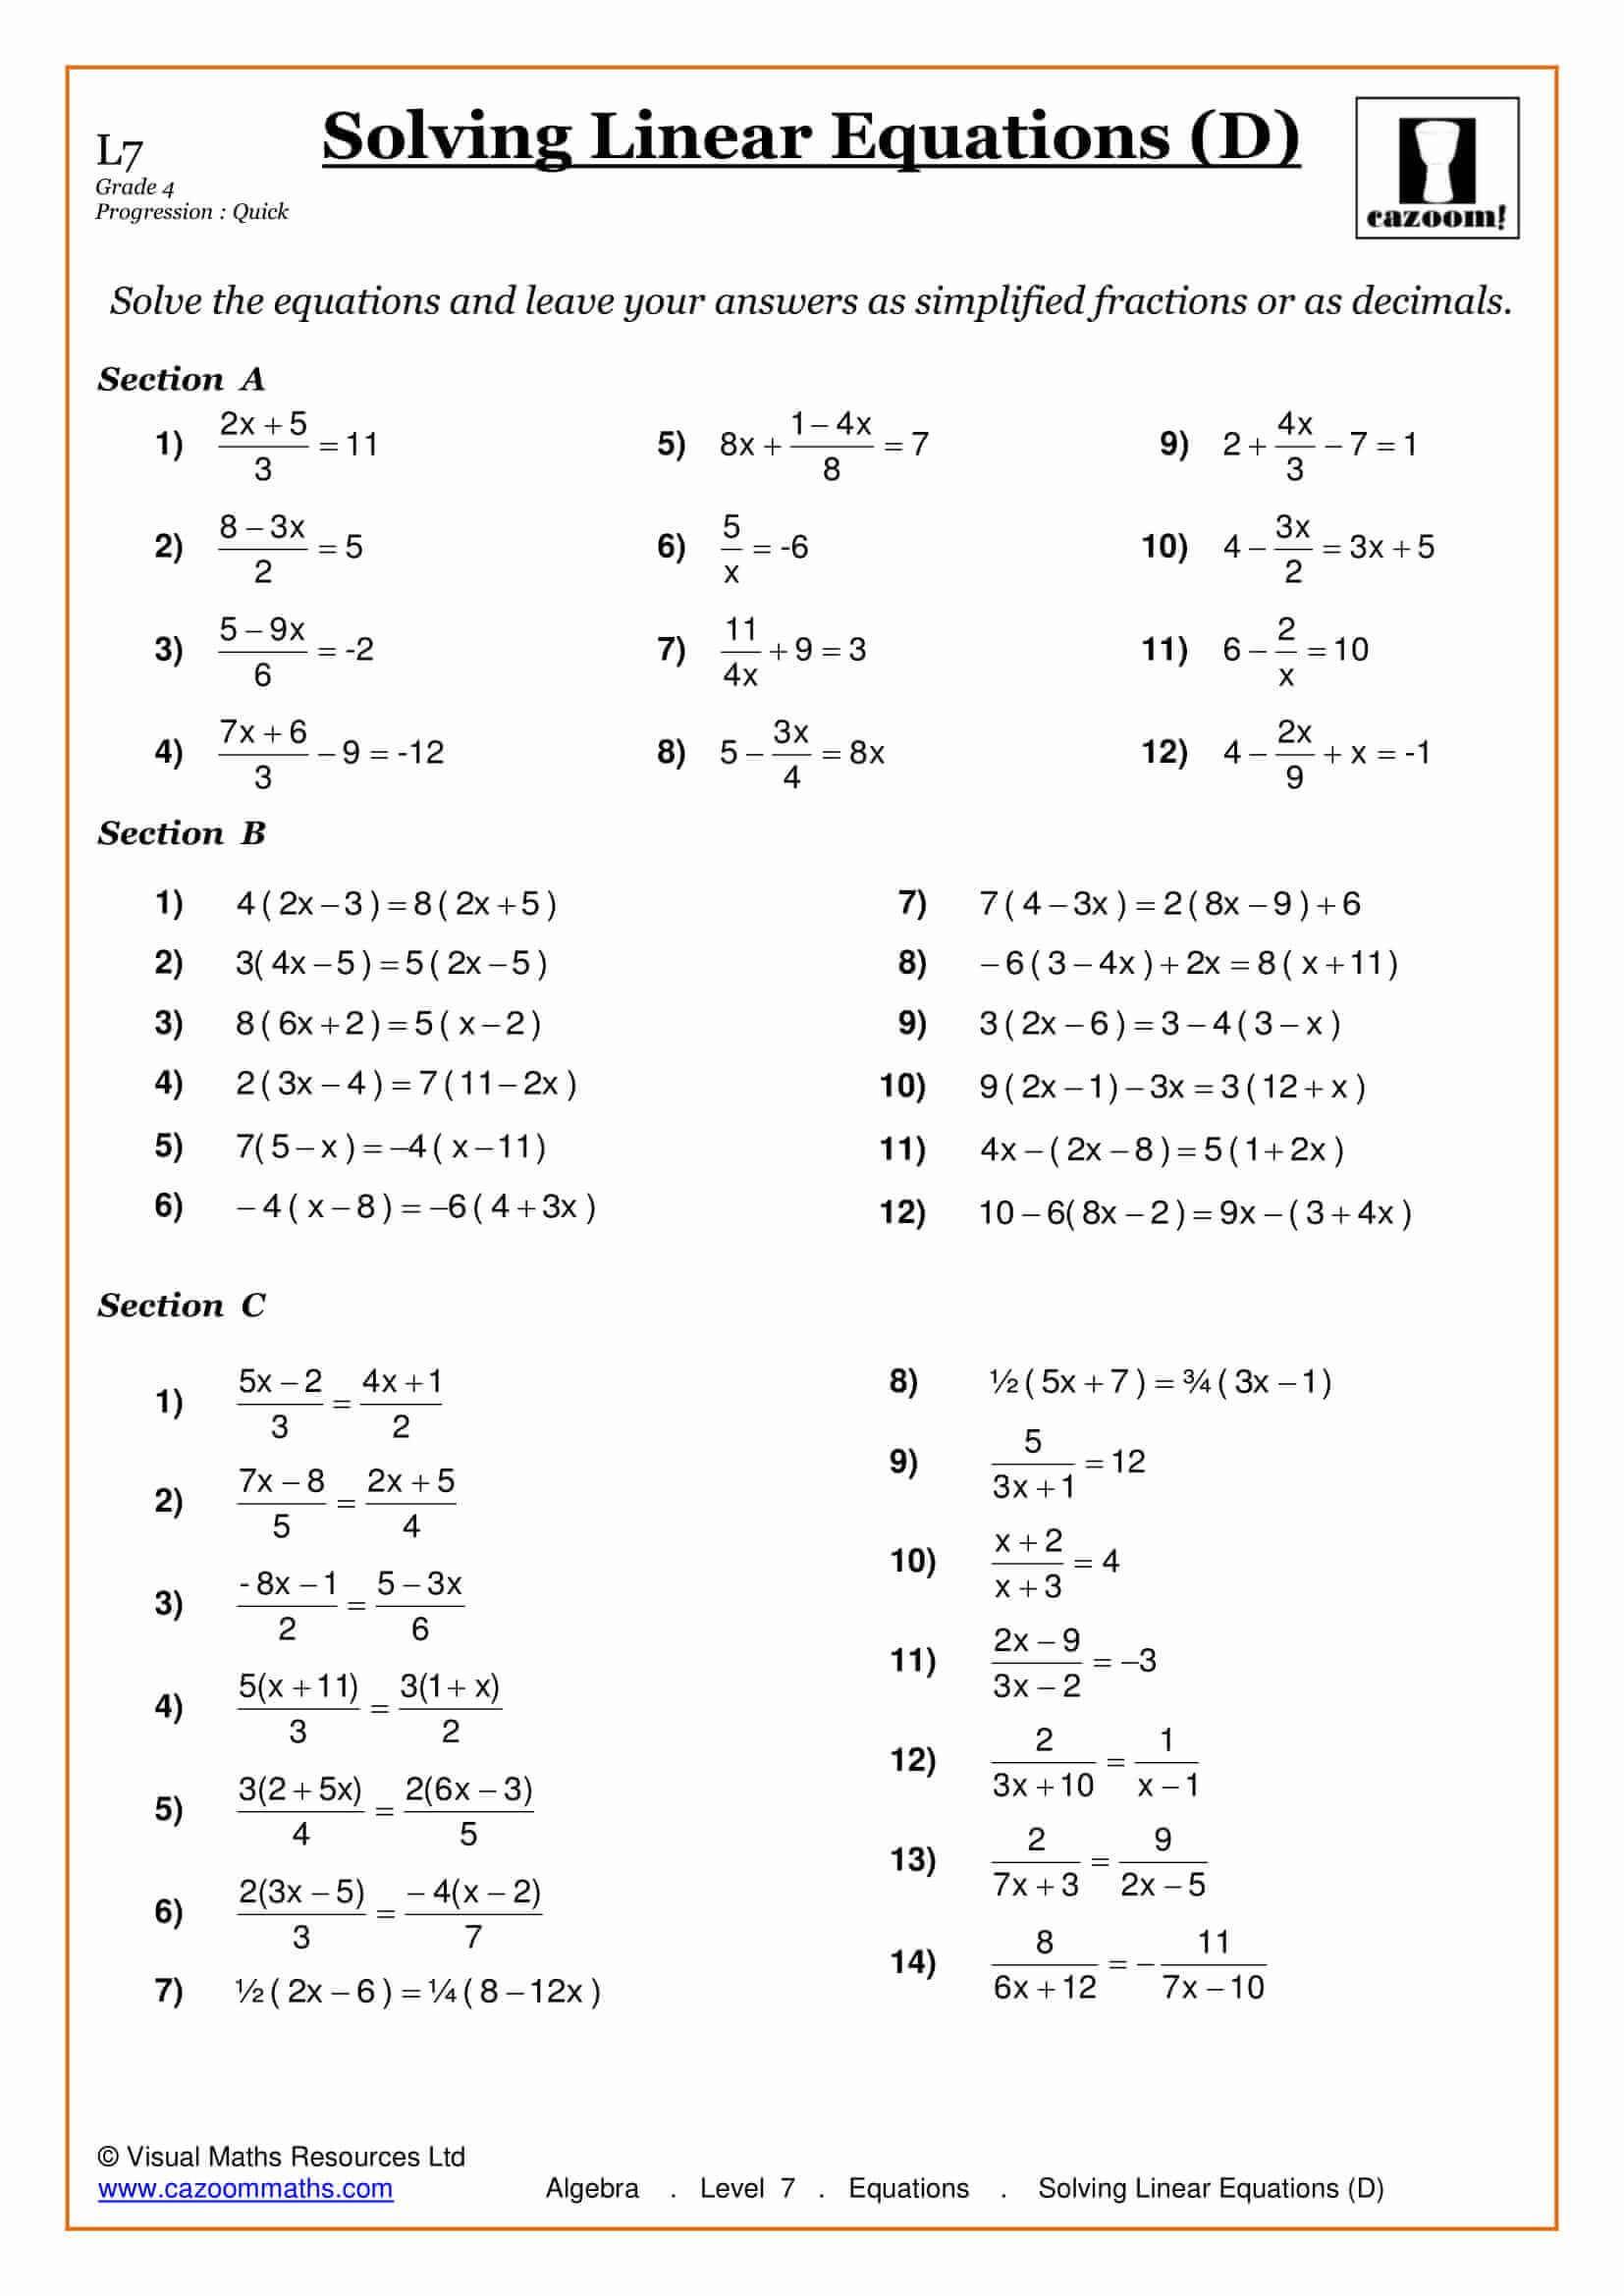 Solving Square Root Equations Worksheet solving Equations Maths Worksheet